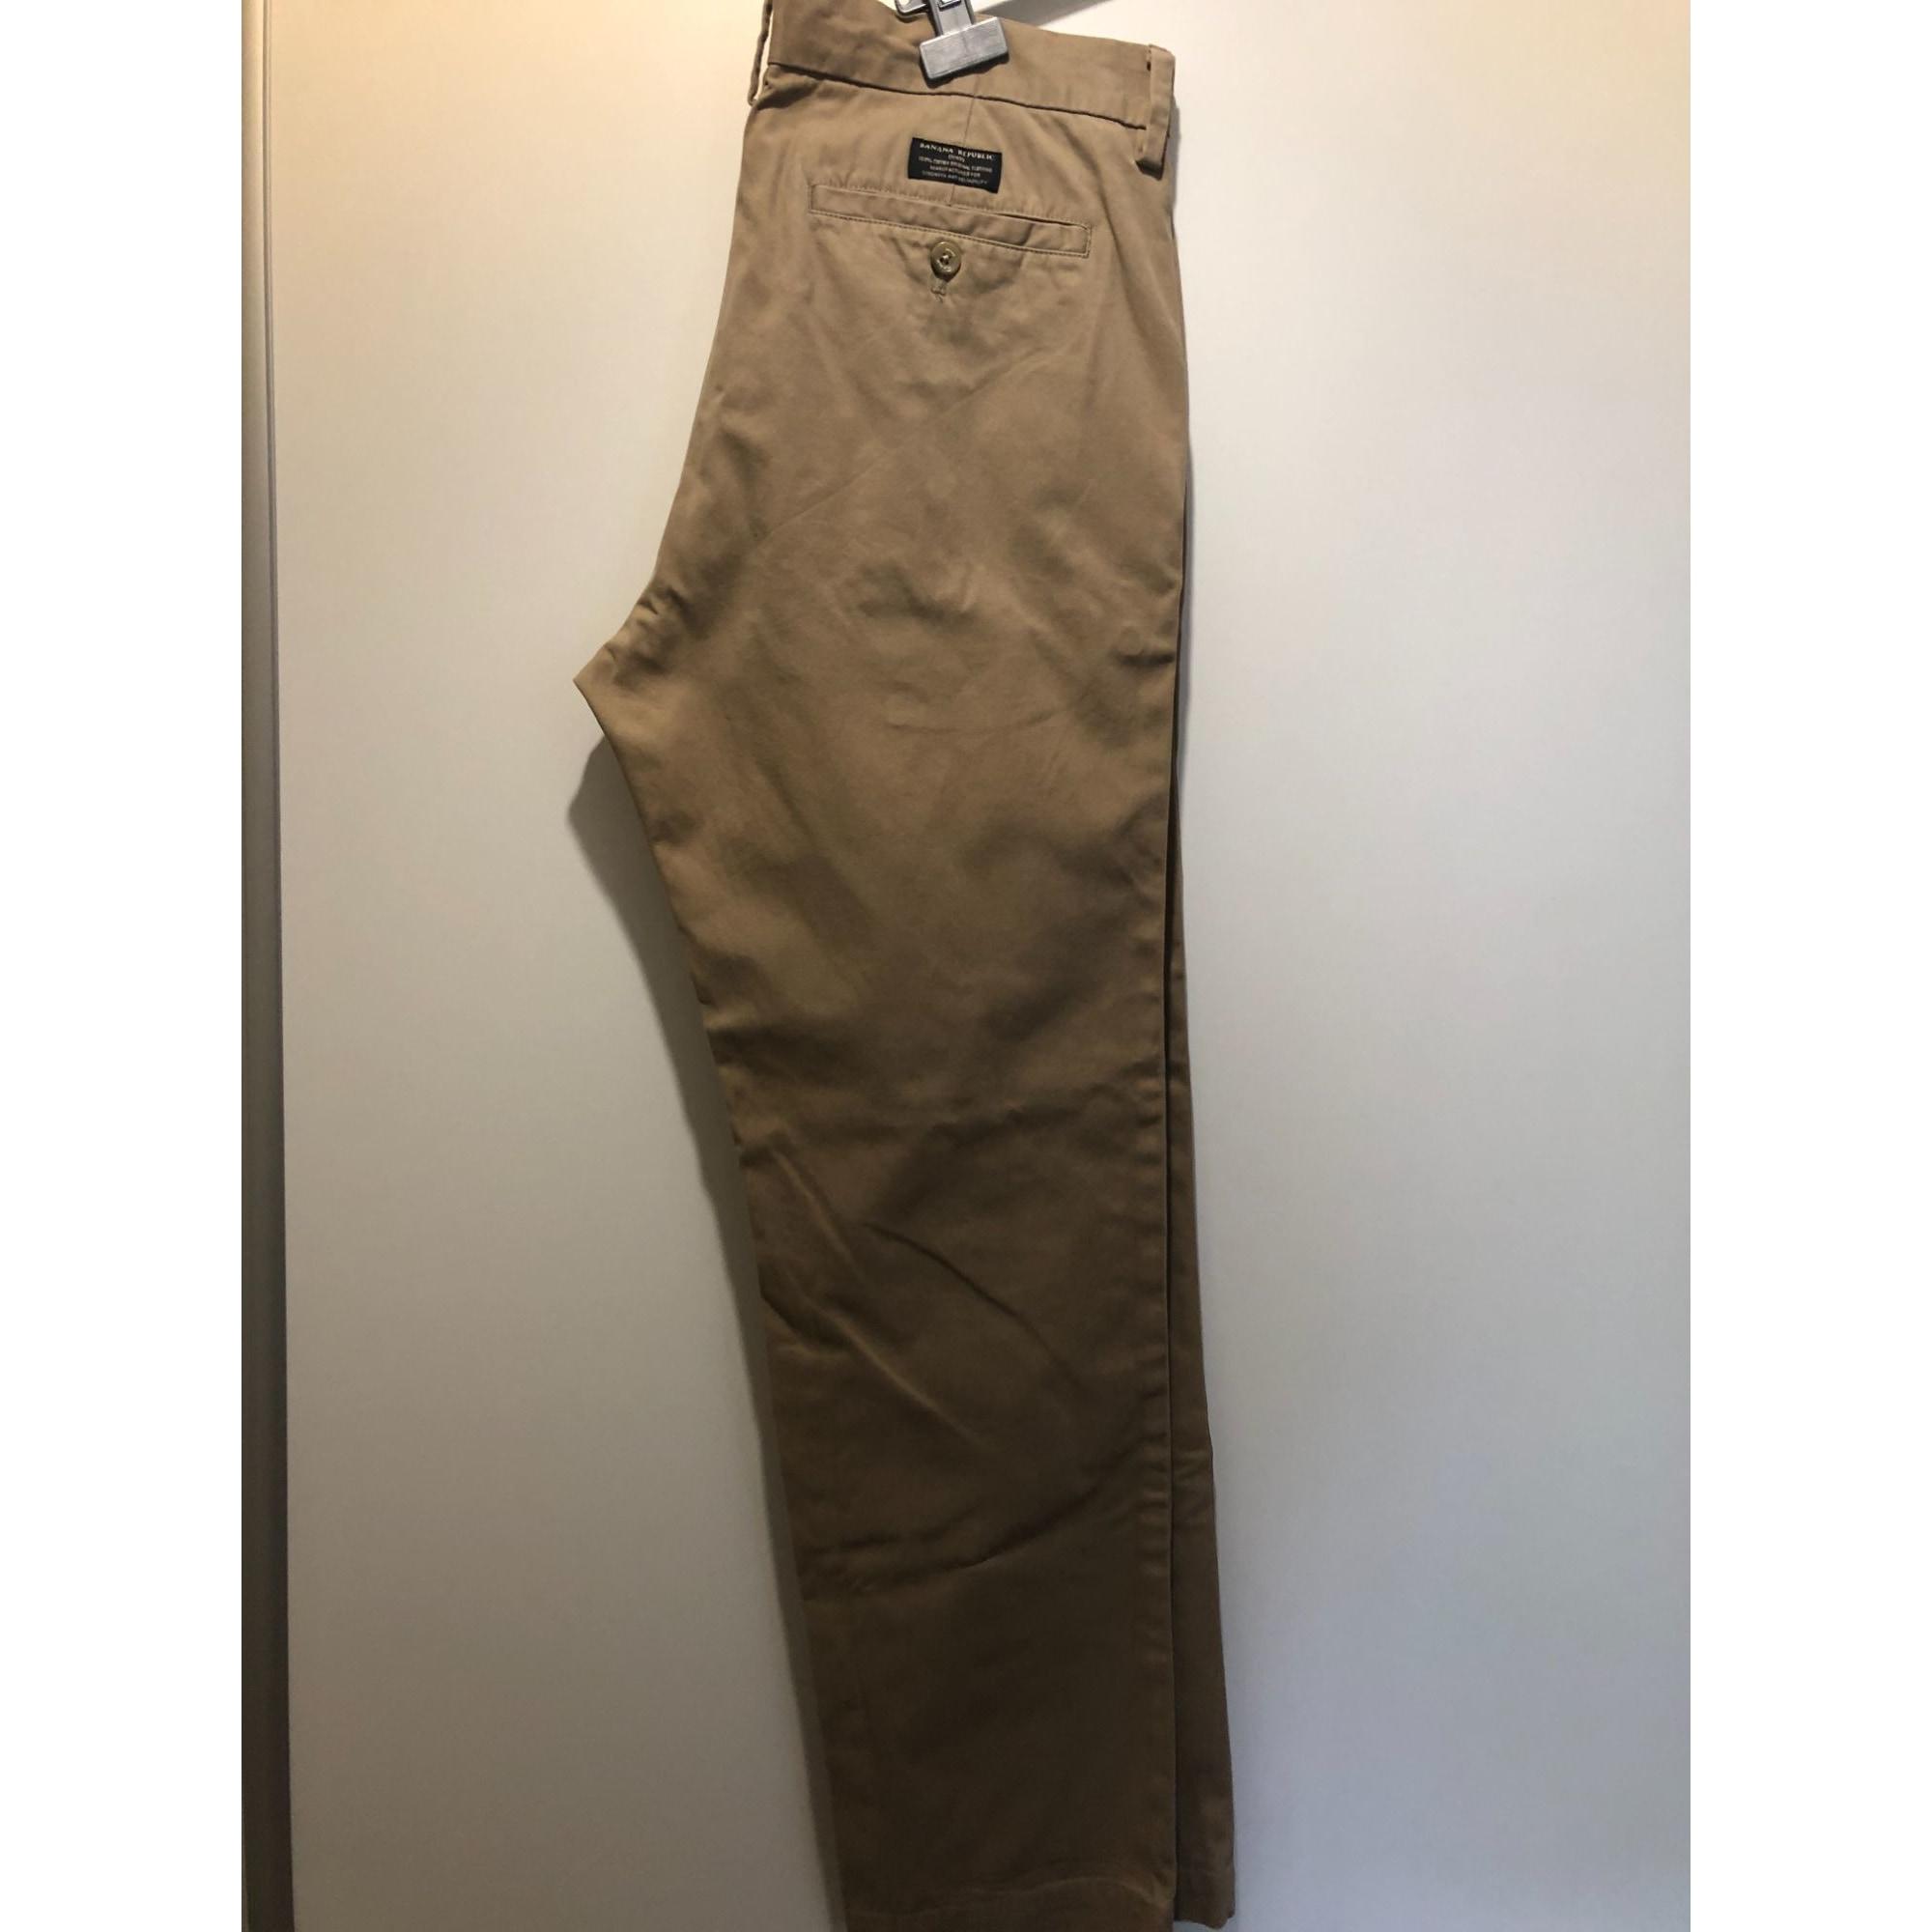 Pantalon droit BANANA REPUBLIC Beige, camel